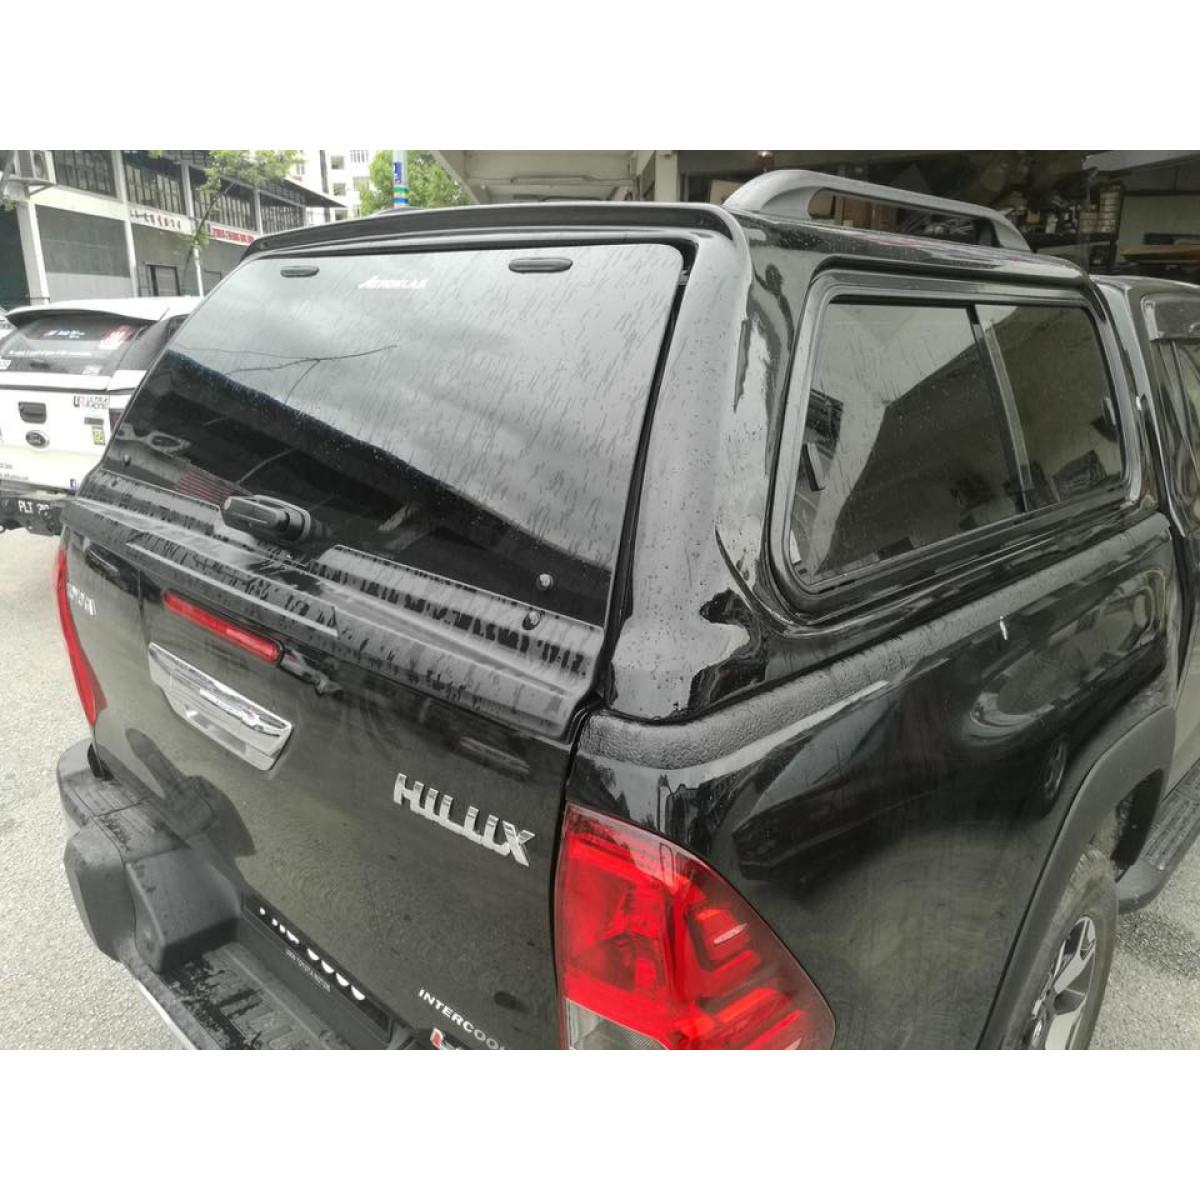 Кунг Hilux 2018